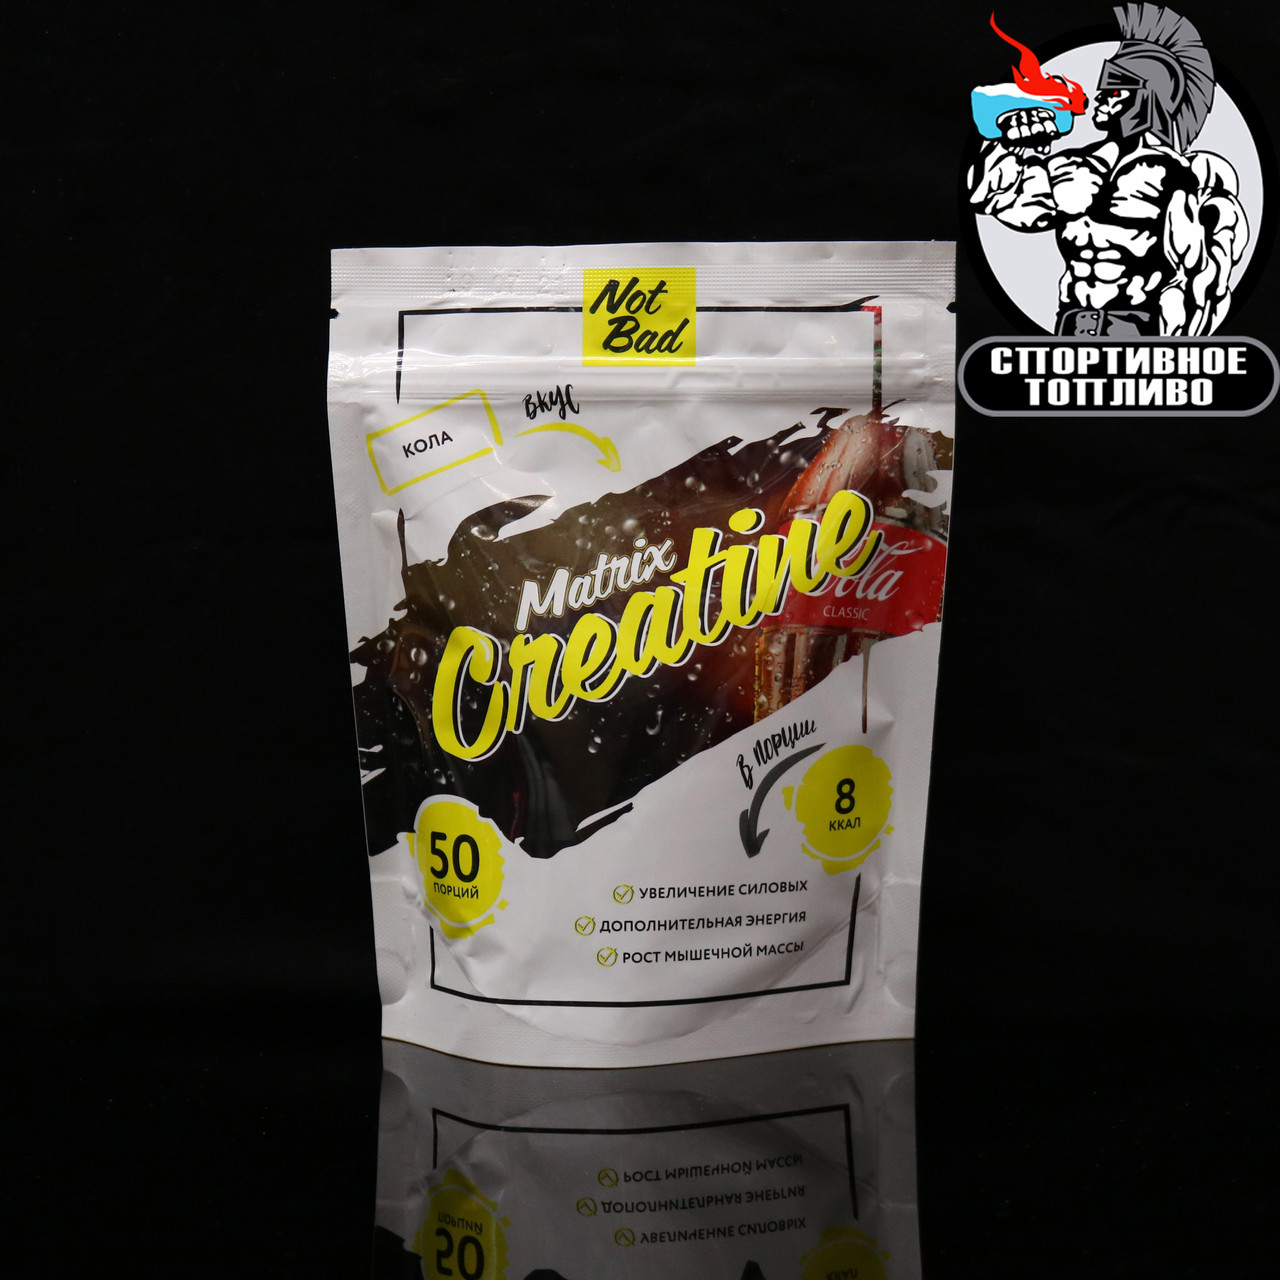 Not Bad - Creatine 250гр/50порций